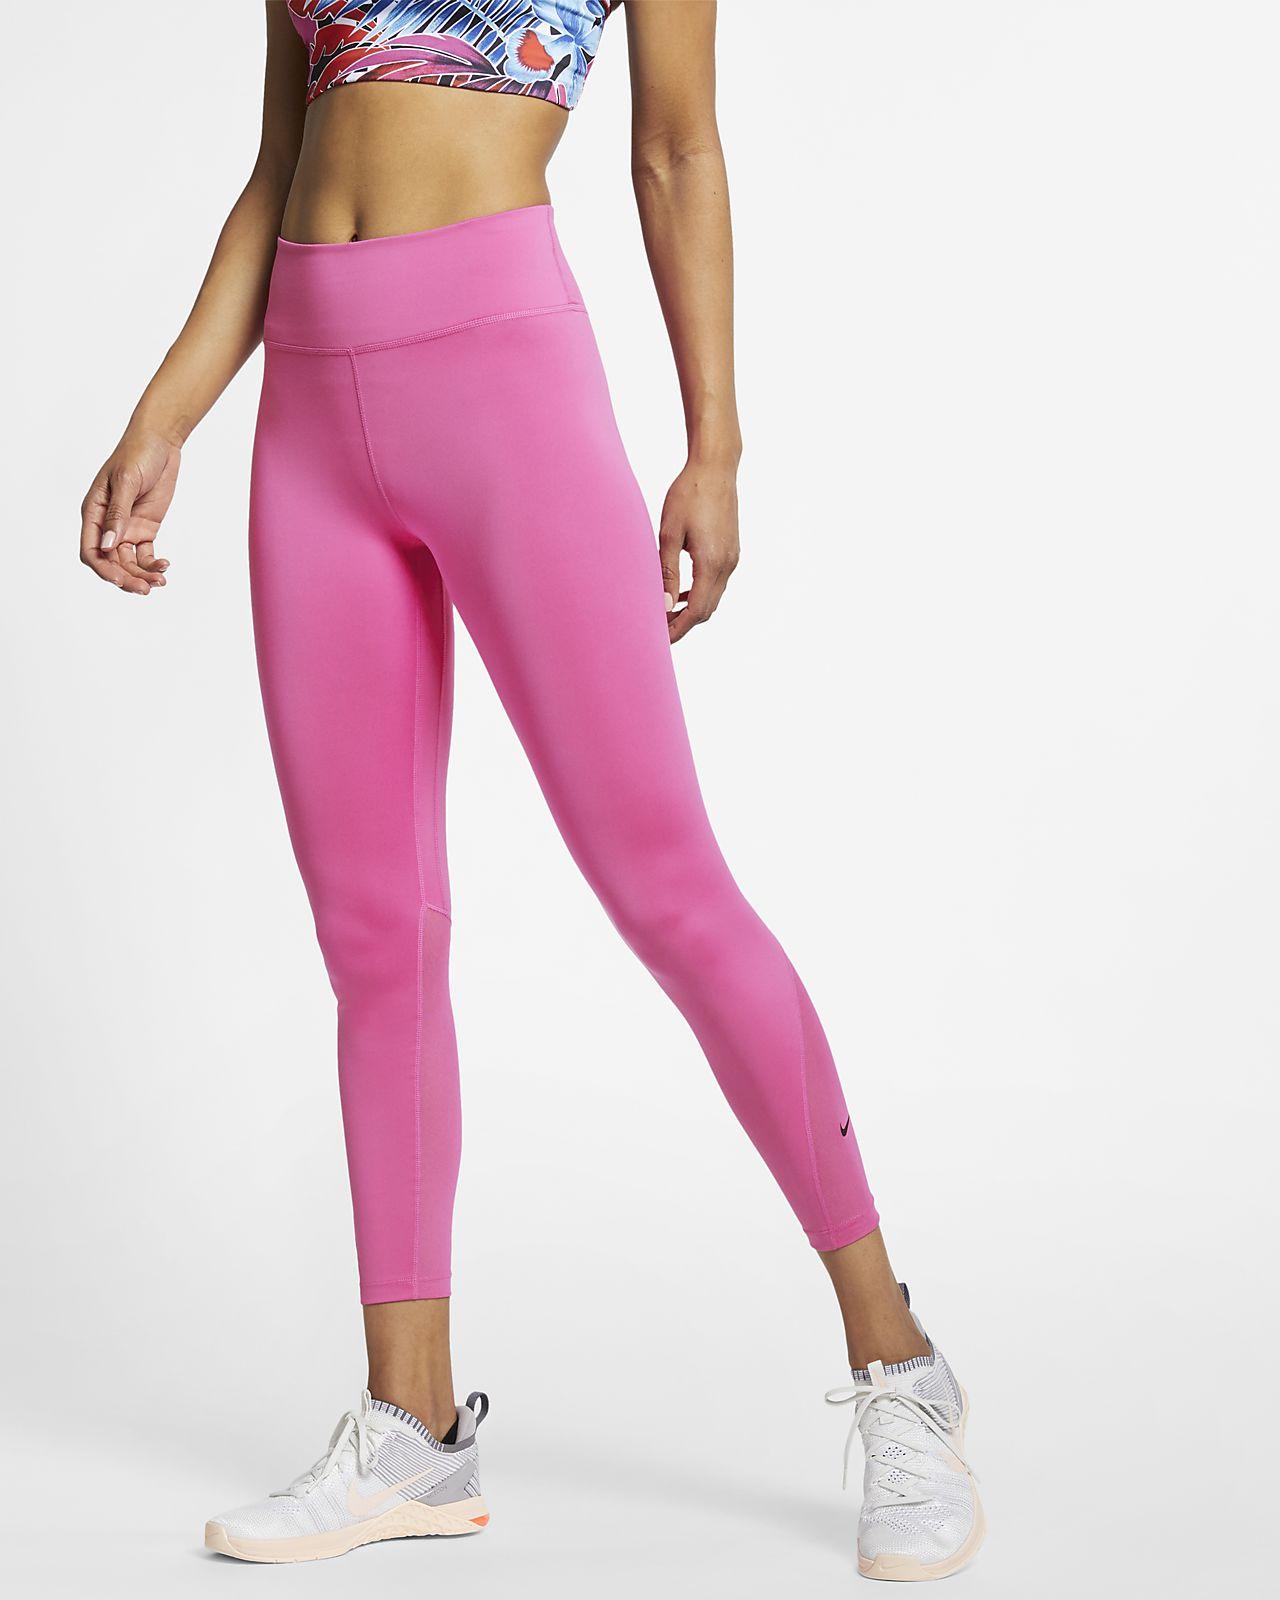 d4d227c97 Nike One Mallas de 7 8 - Mujer. Nike.com ES